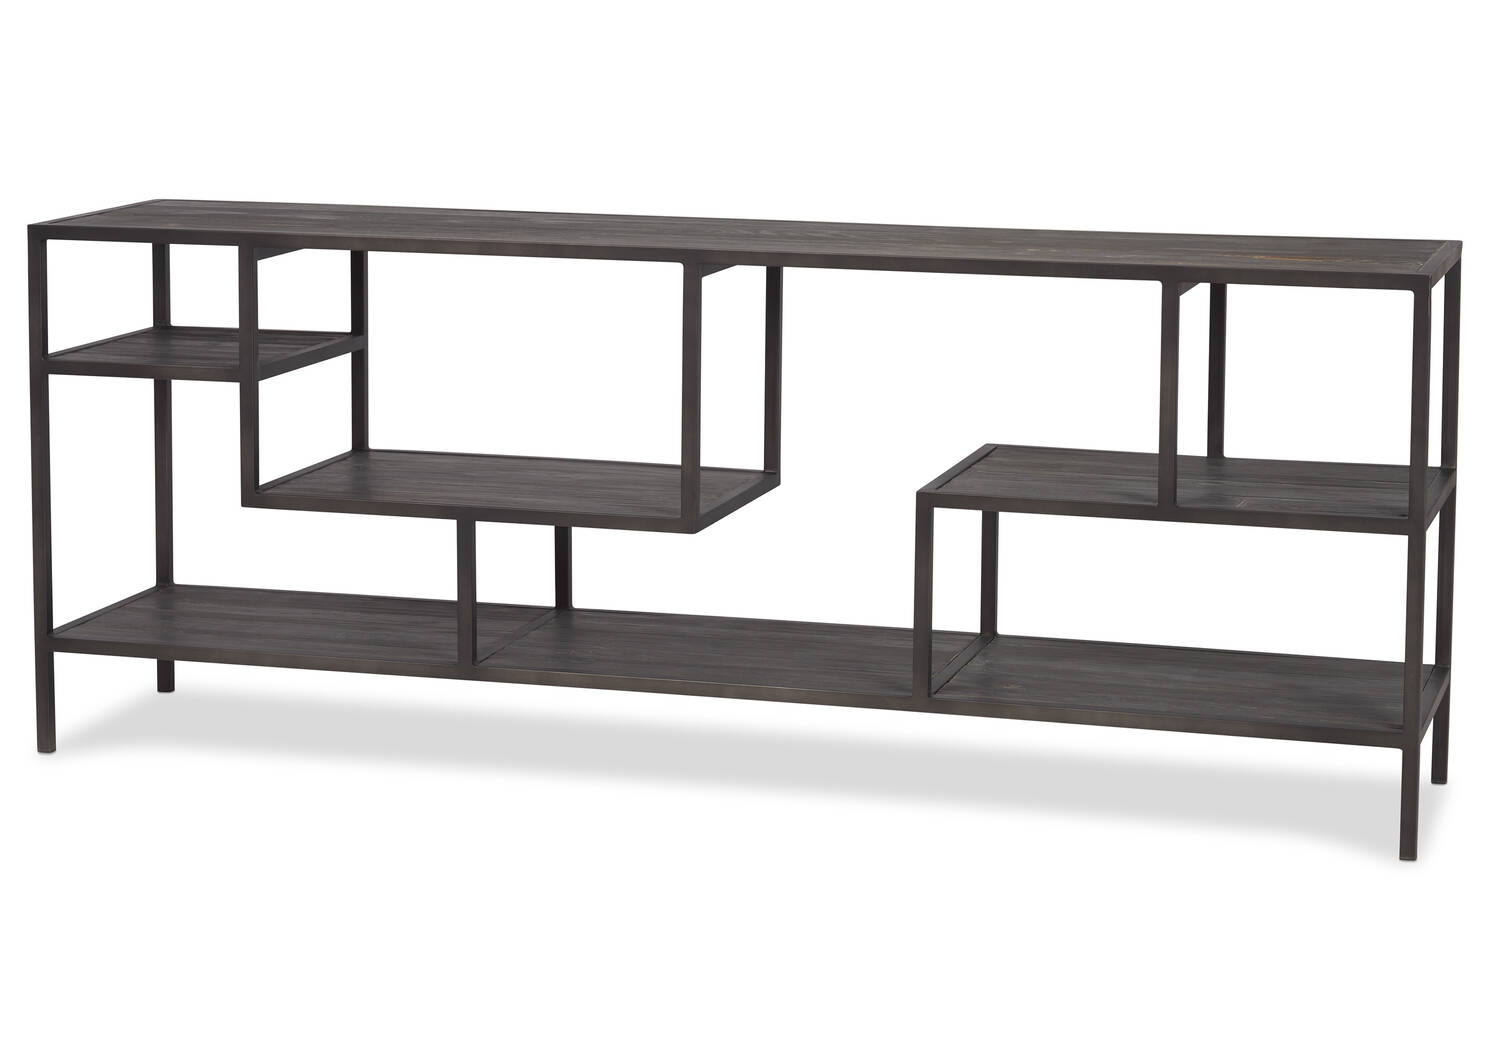 Krystien Low Display Shelf -Digby Smoke